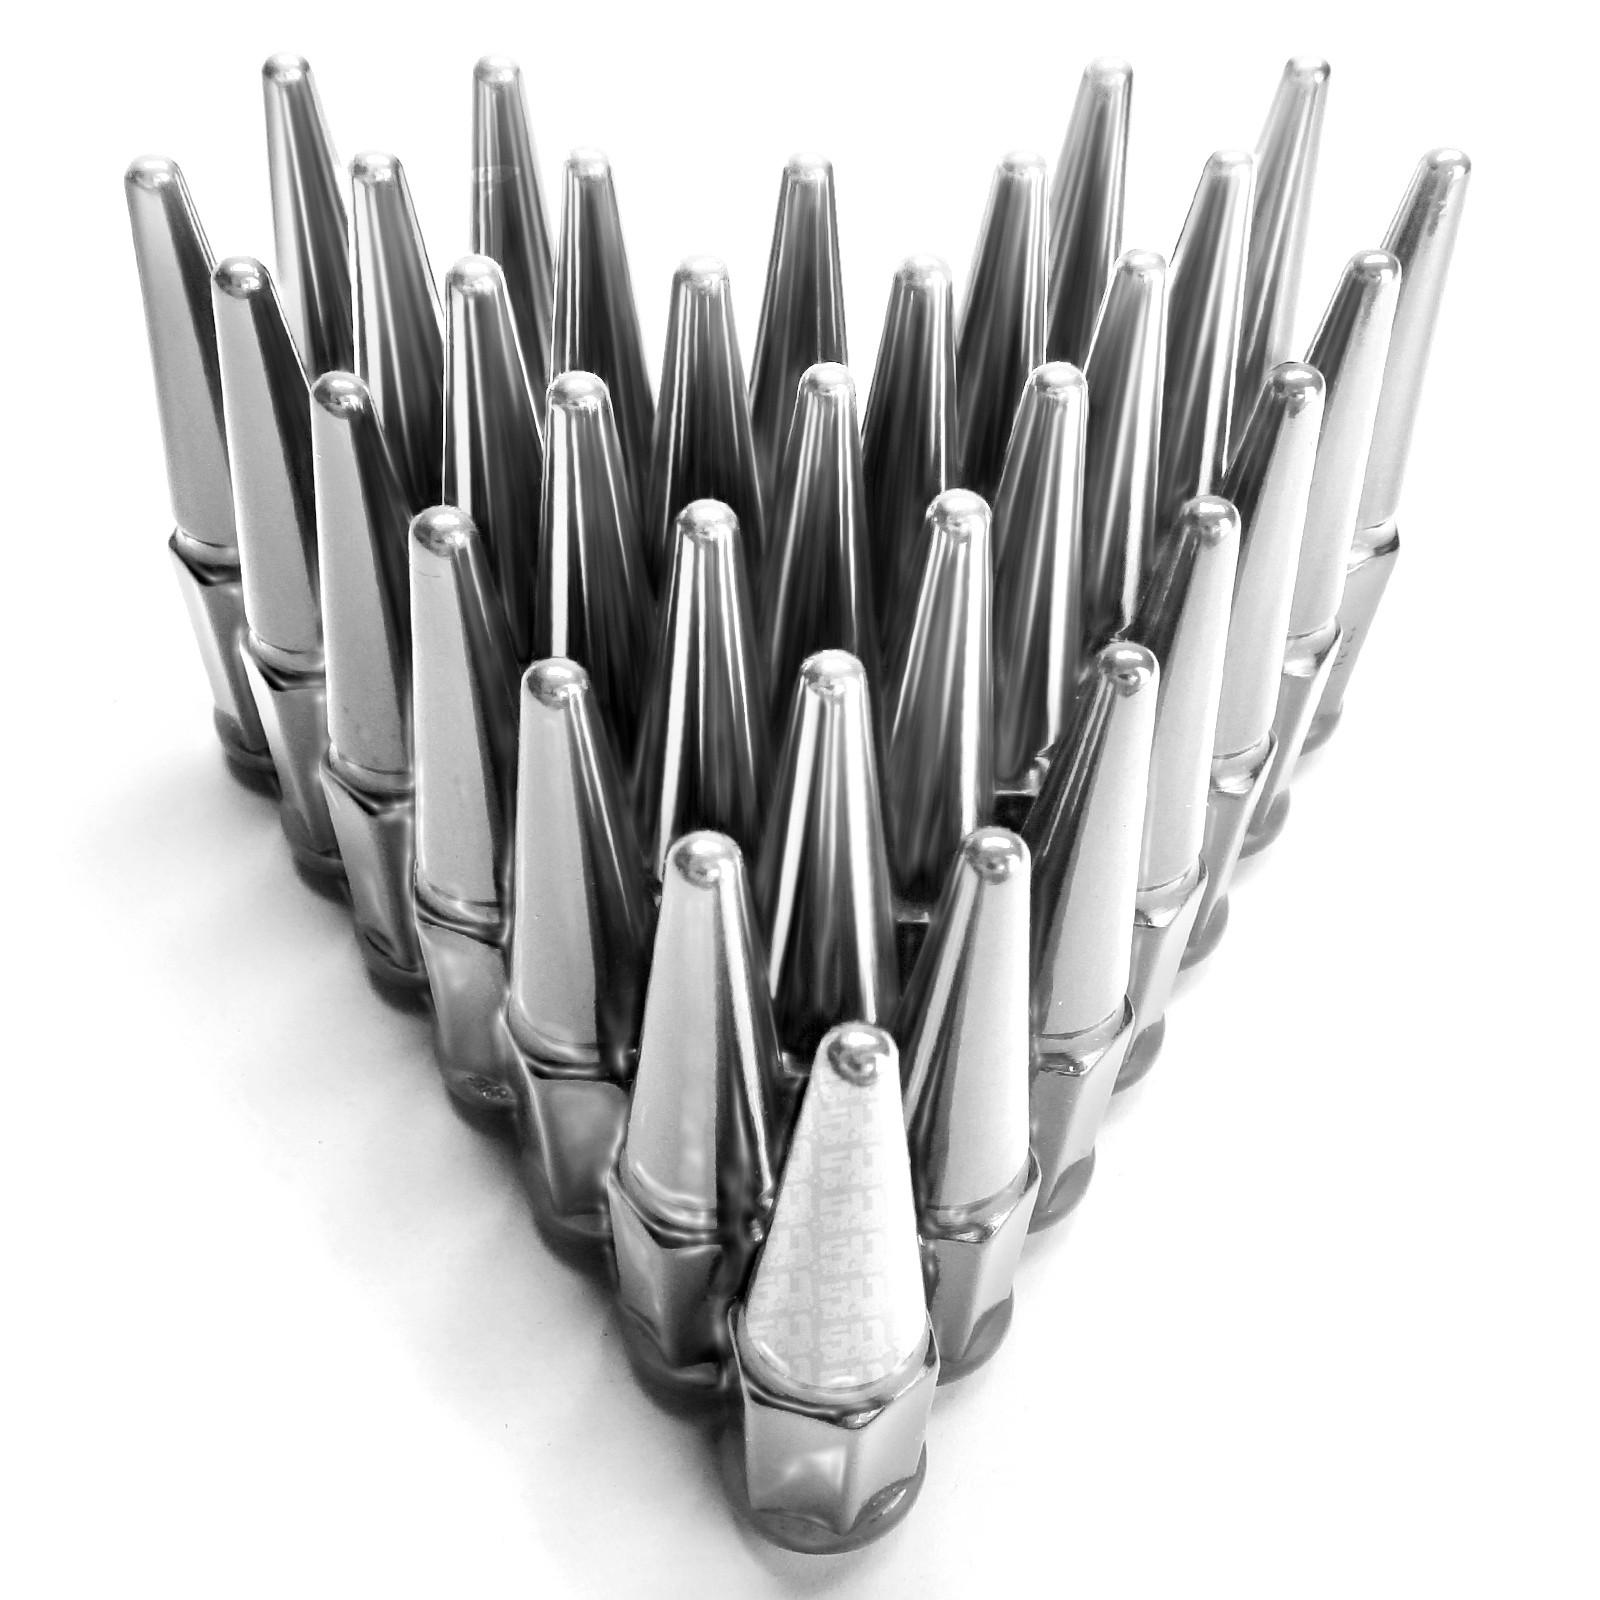 Spike Lug Nuts 14x2 0 Coarse Thread Fit F250 F350 Super Duty Powerstroke Chrome